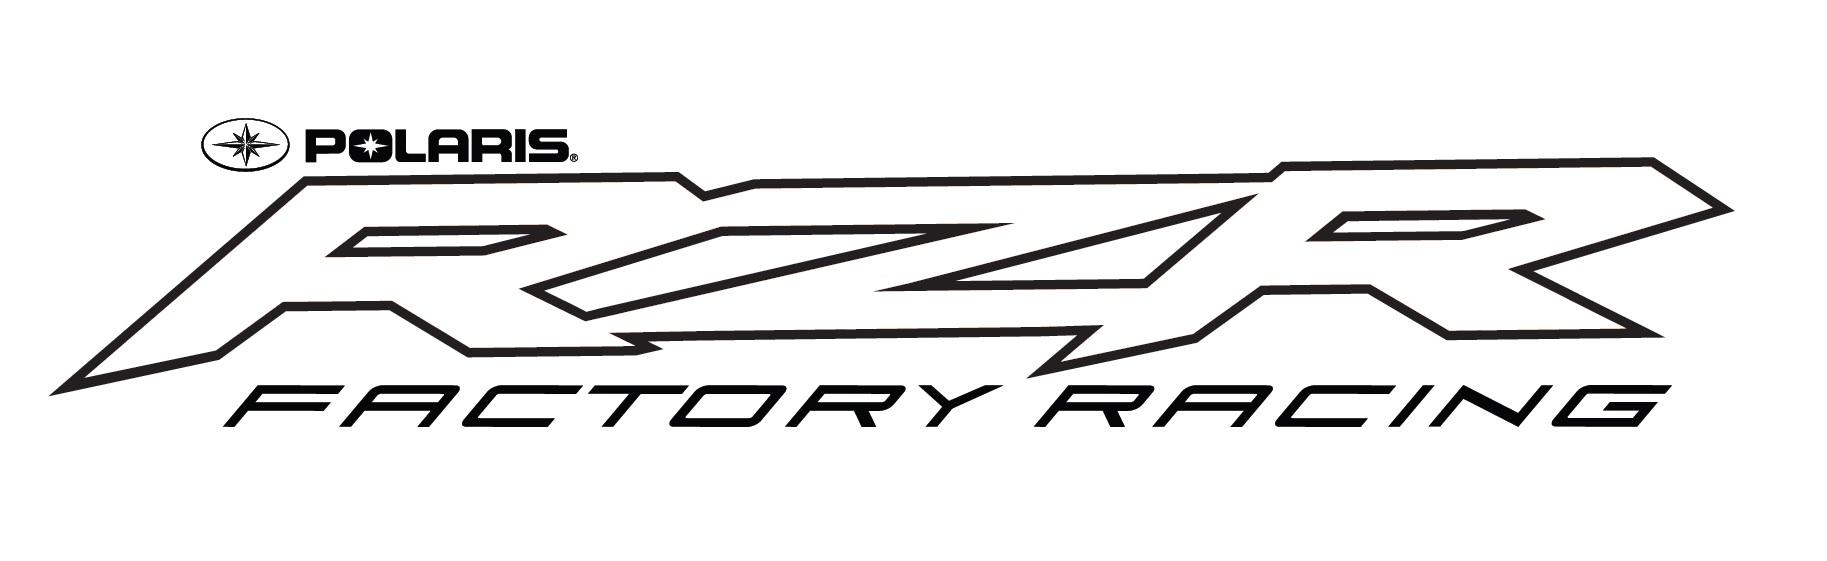 Polaris Rzr >> Polaris Announces 2017 Off-Road Race Team, RZR Racer Discount Program and New Racing Website ...